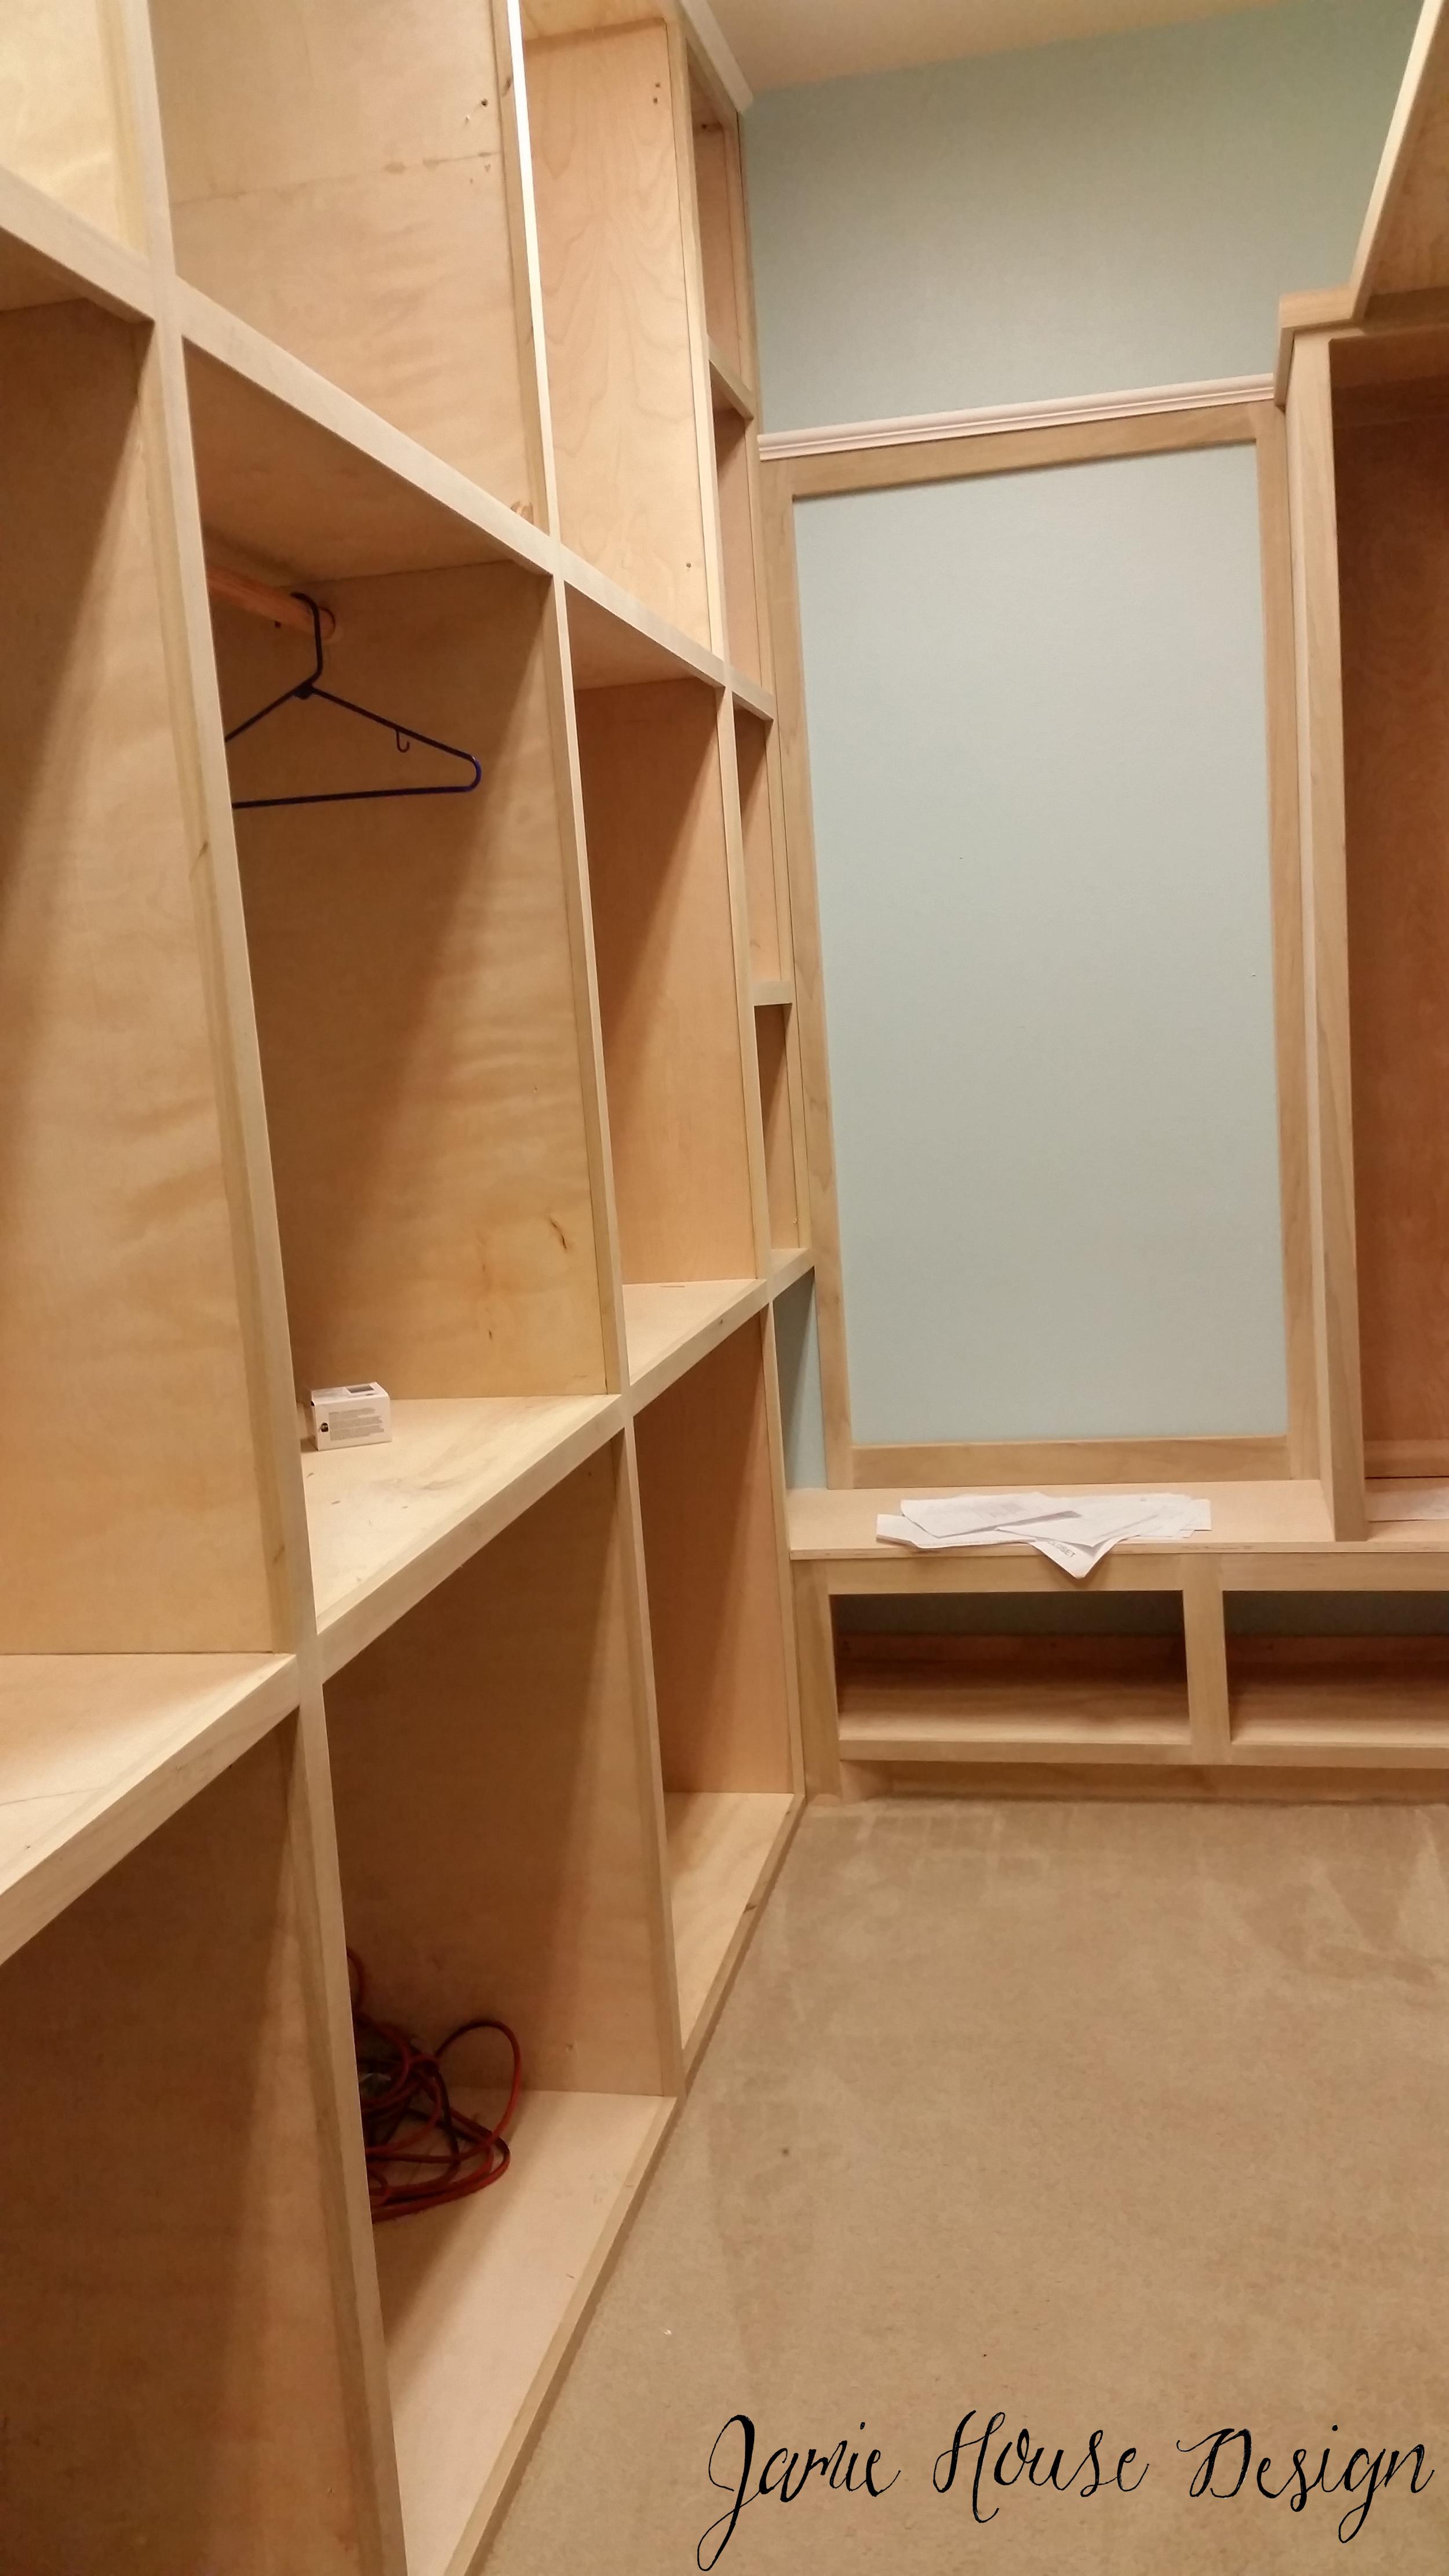 Closet in progress- Jamie House Design